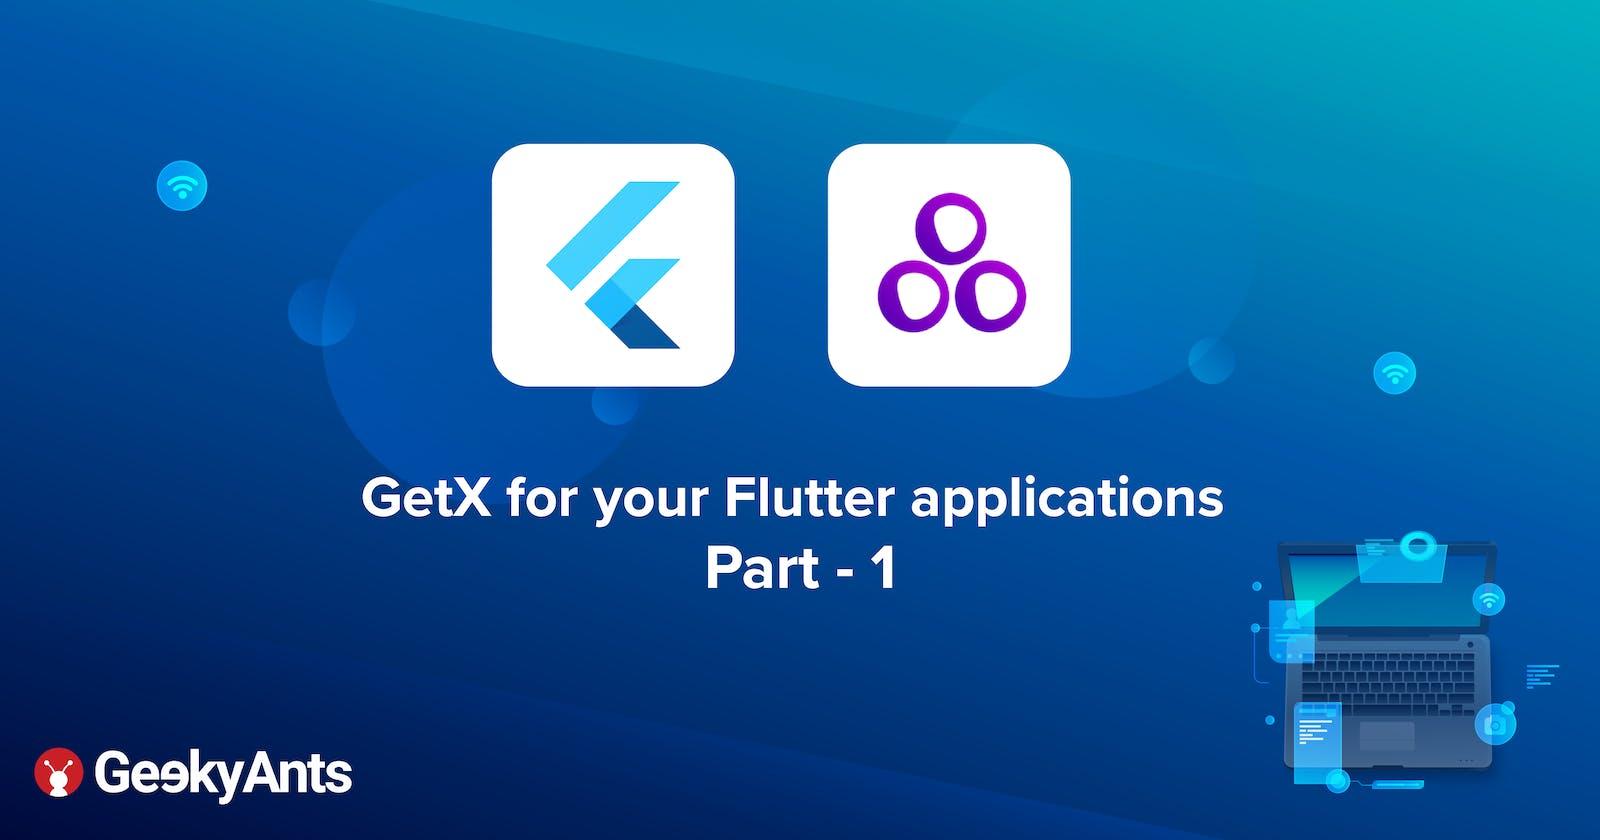 GetX for your Flutter applications - Part 1